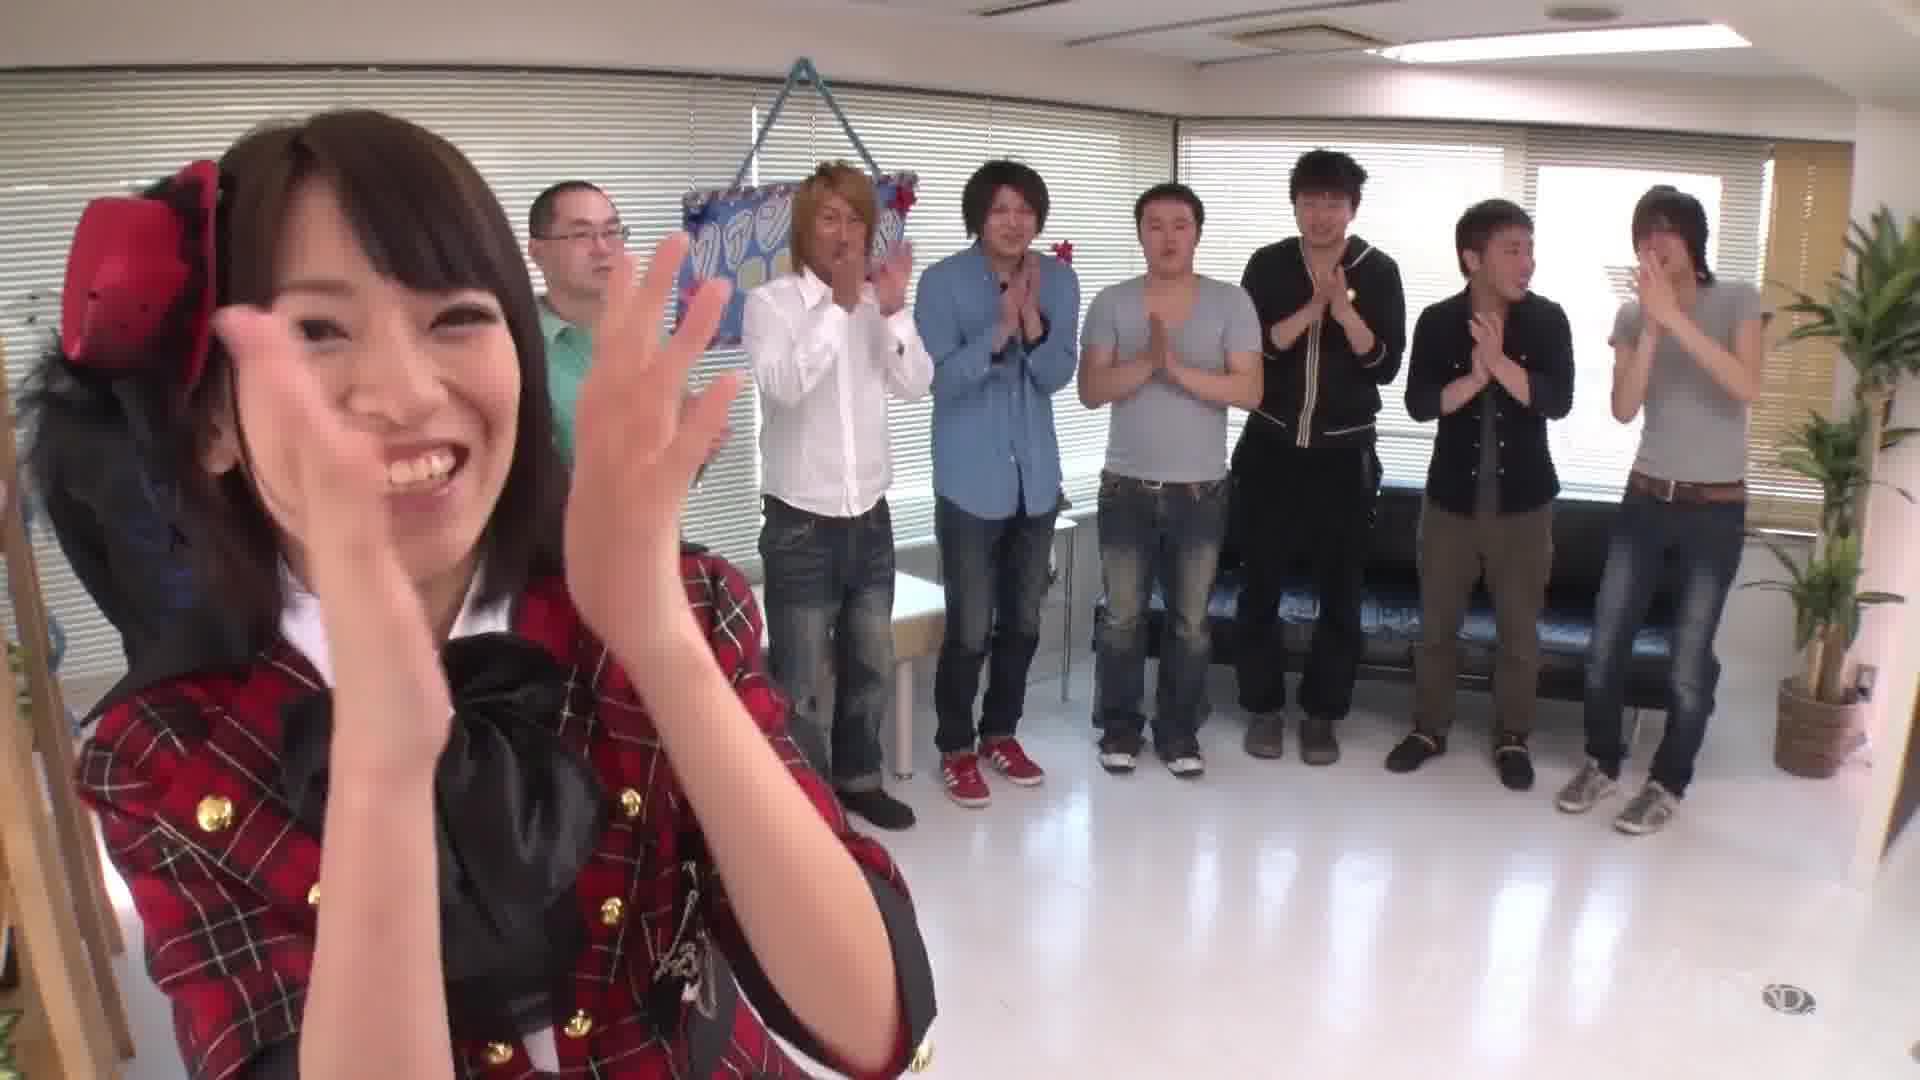 CRB48 ~後しか向かねえ感謝デー~ - 成宮ルリ【コスプレ・乱交・アイドル】